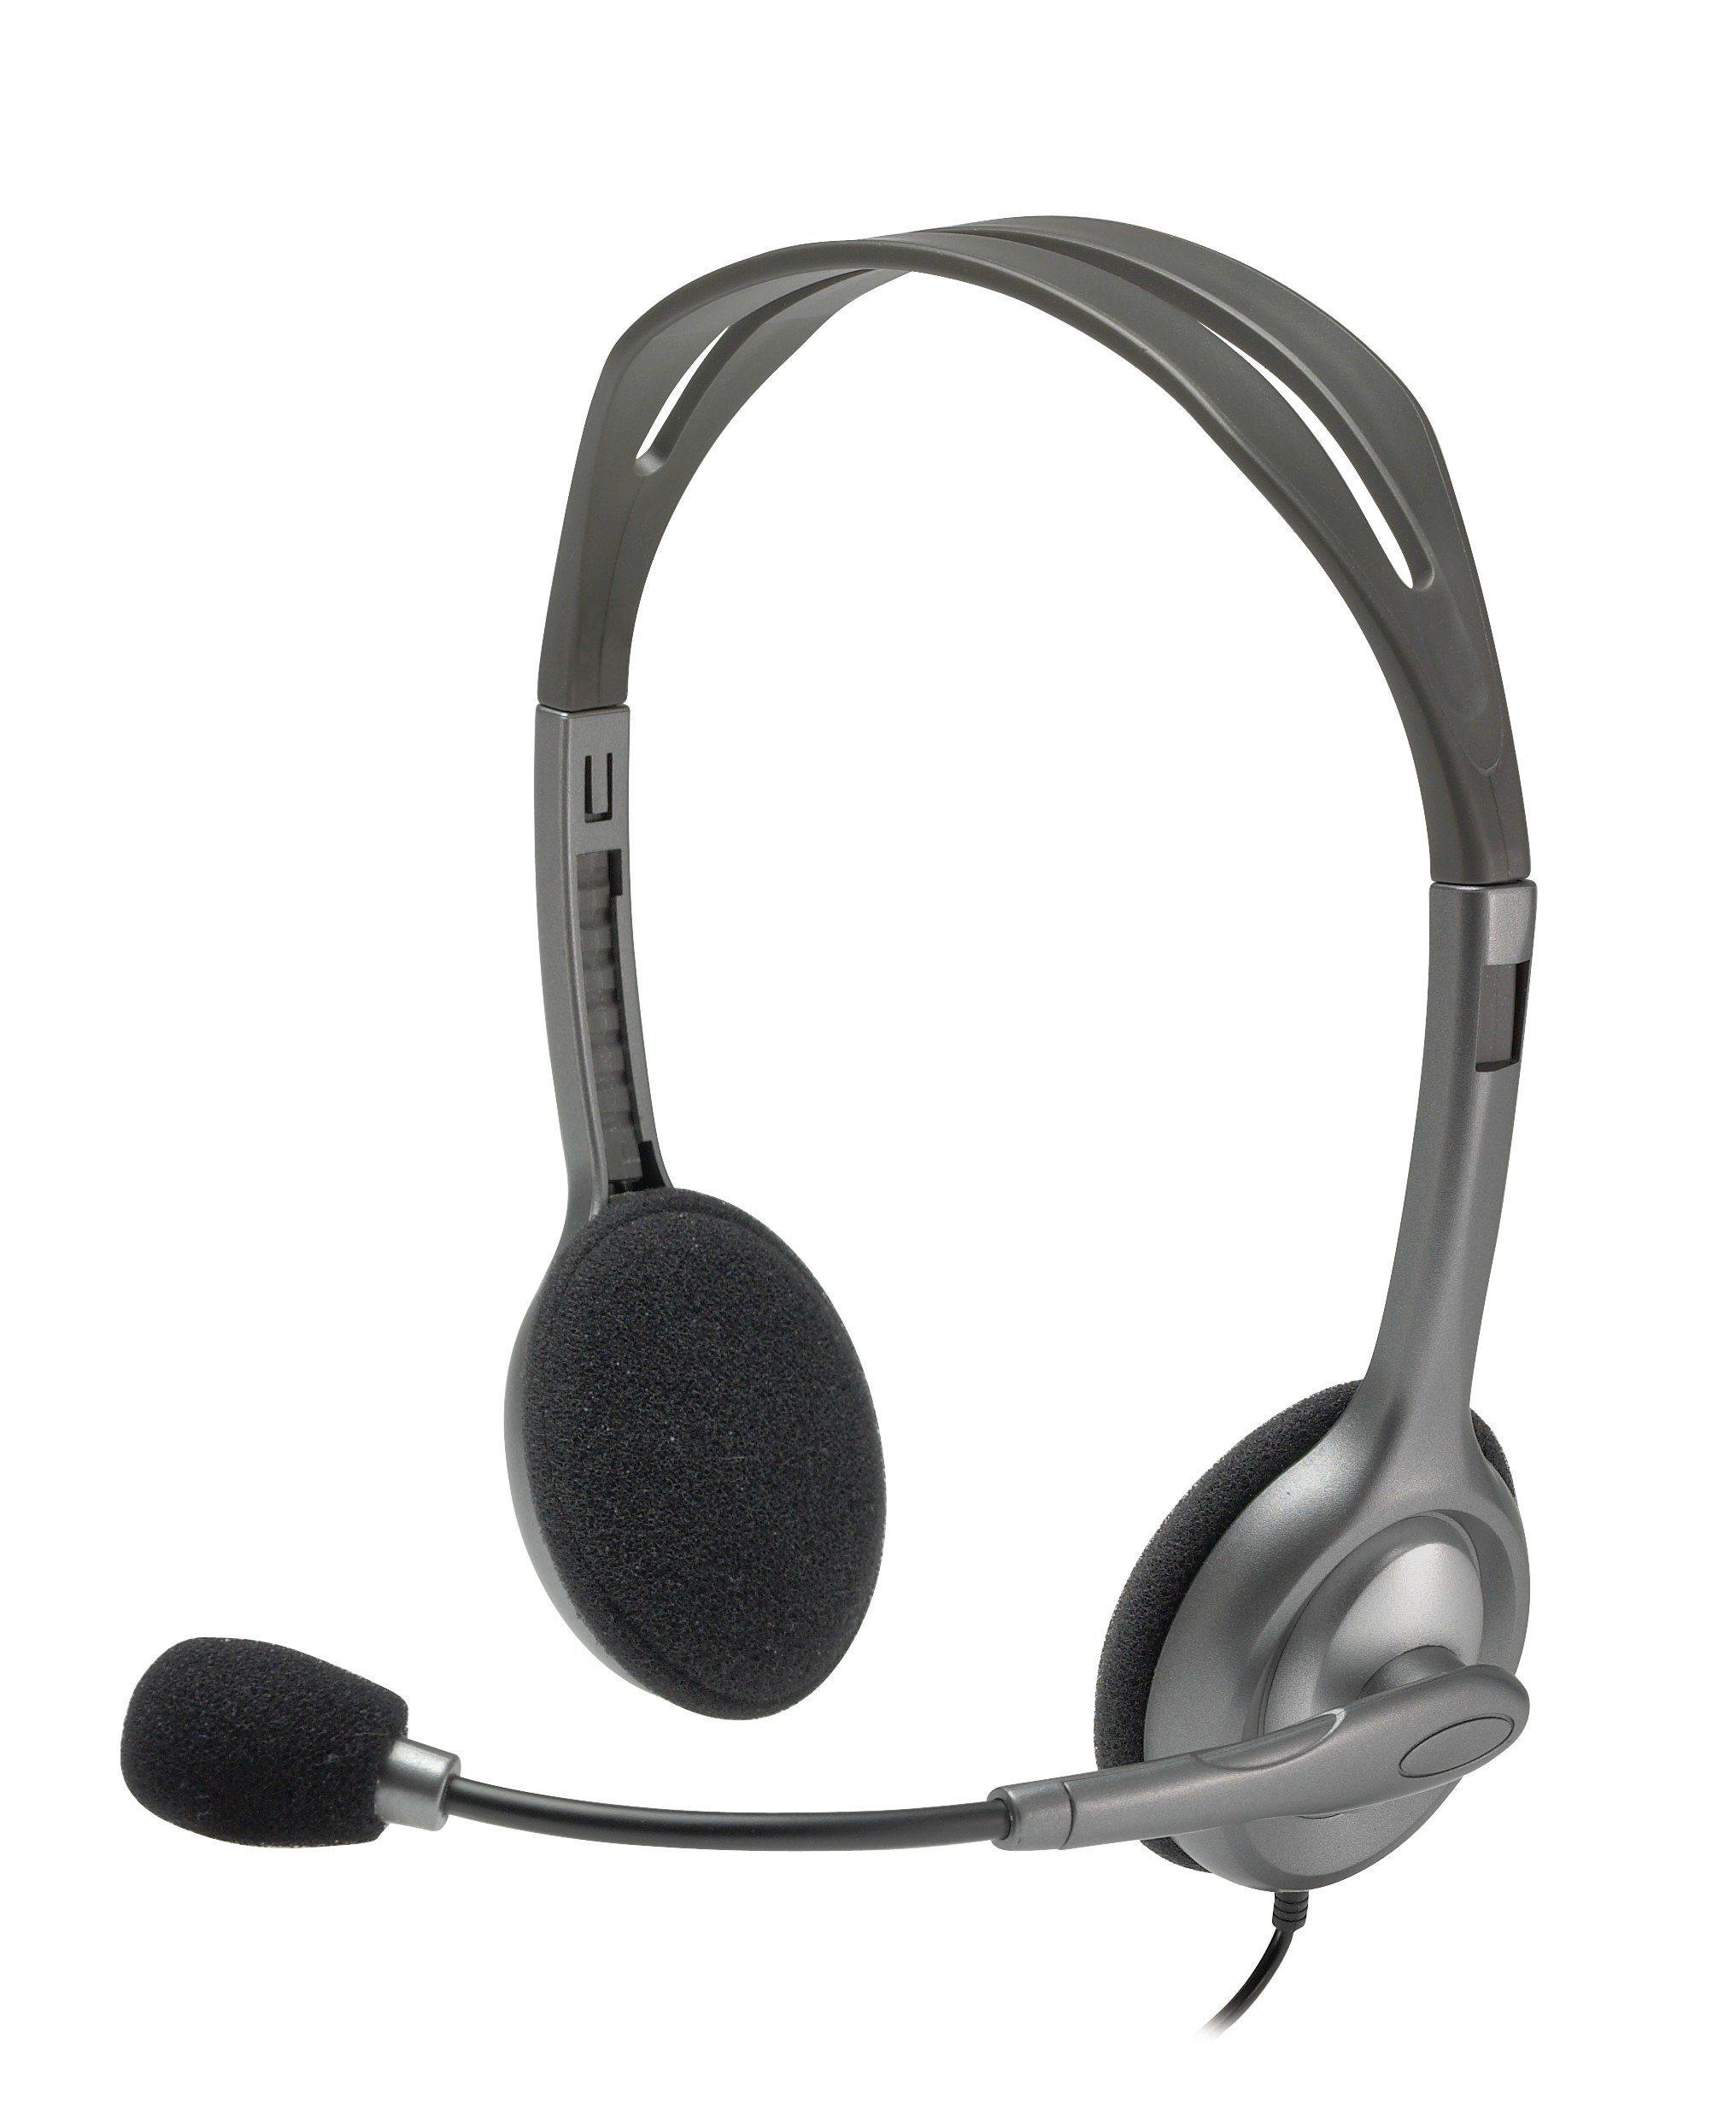 Logitech Headset »Stereo Headset H110 - 981-000271«